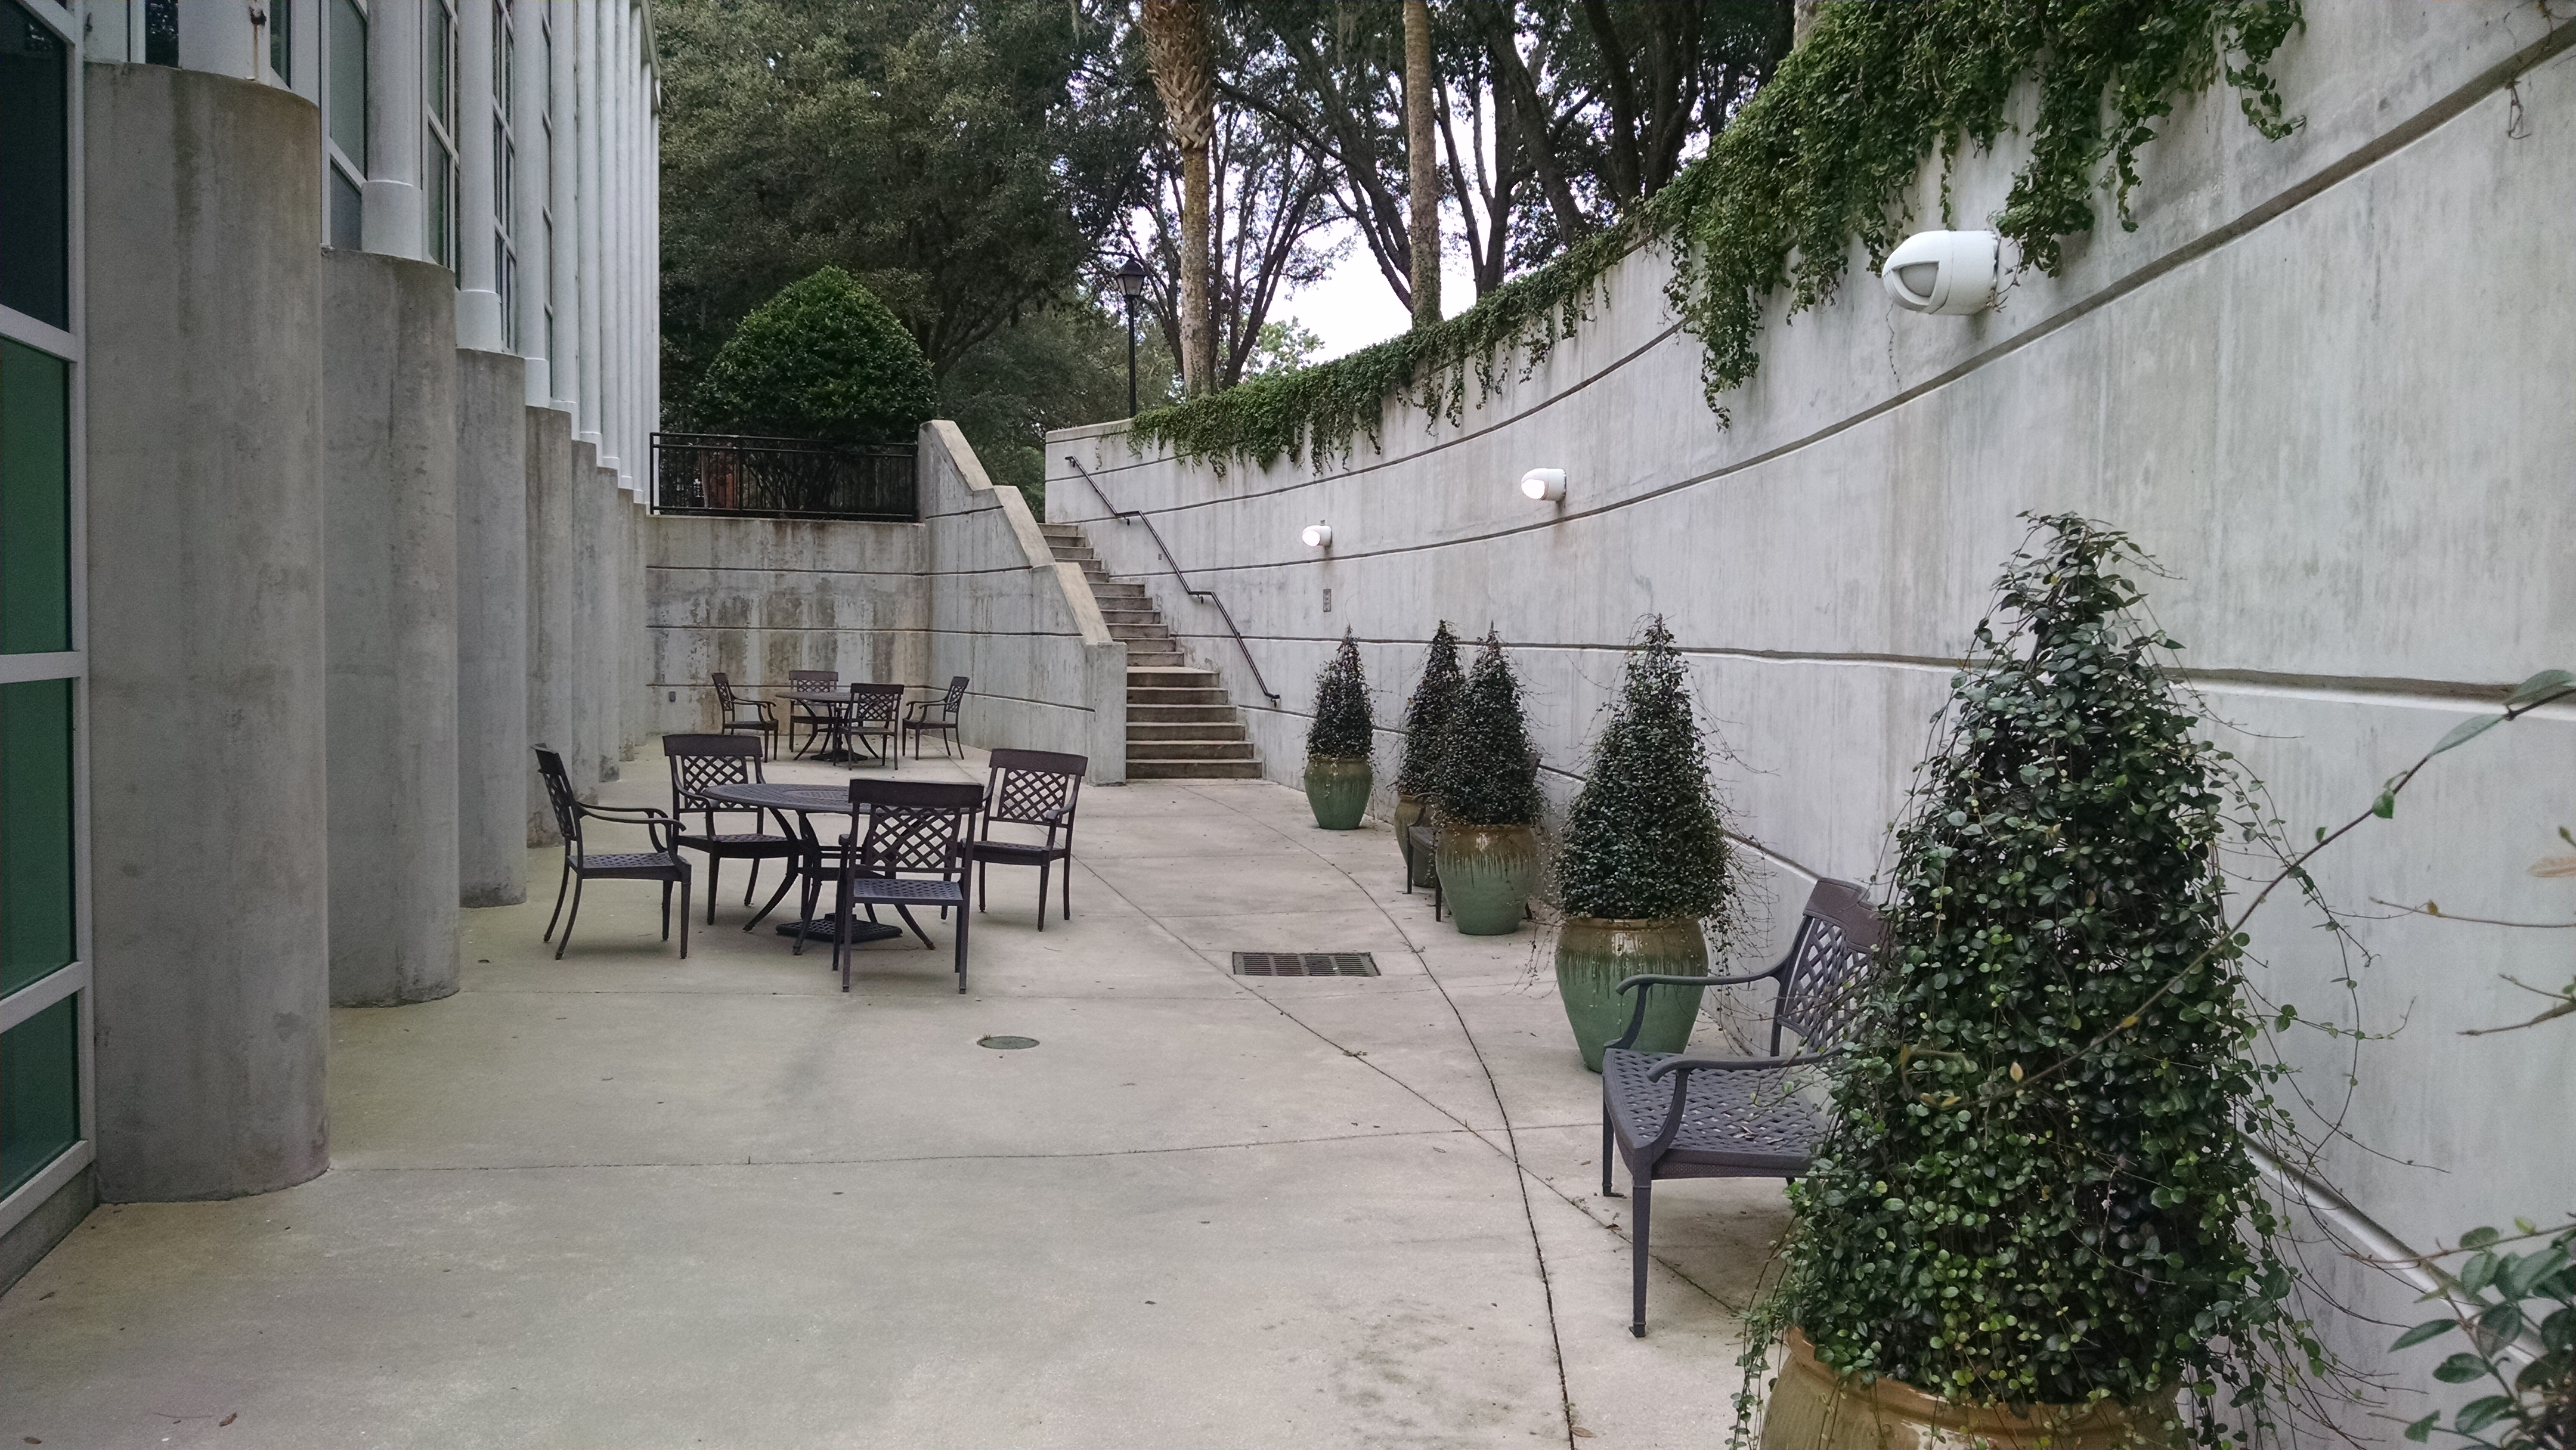 Nemec Courtyard